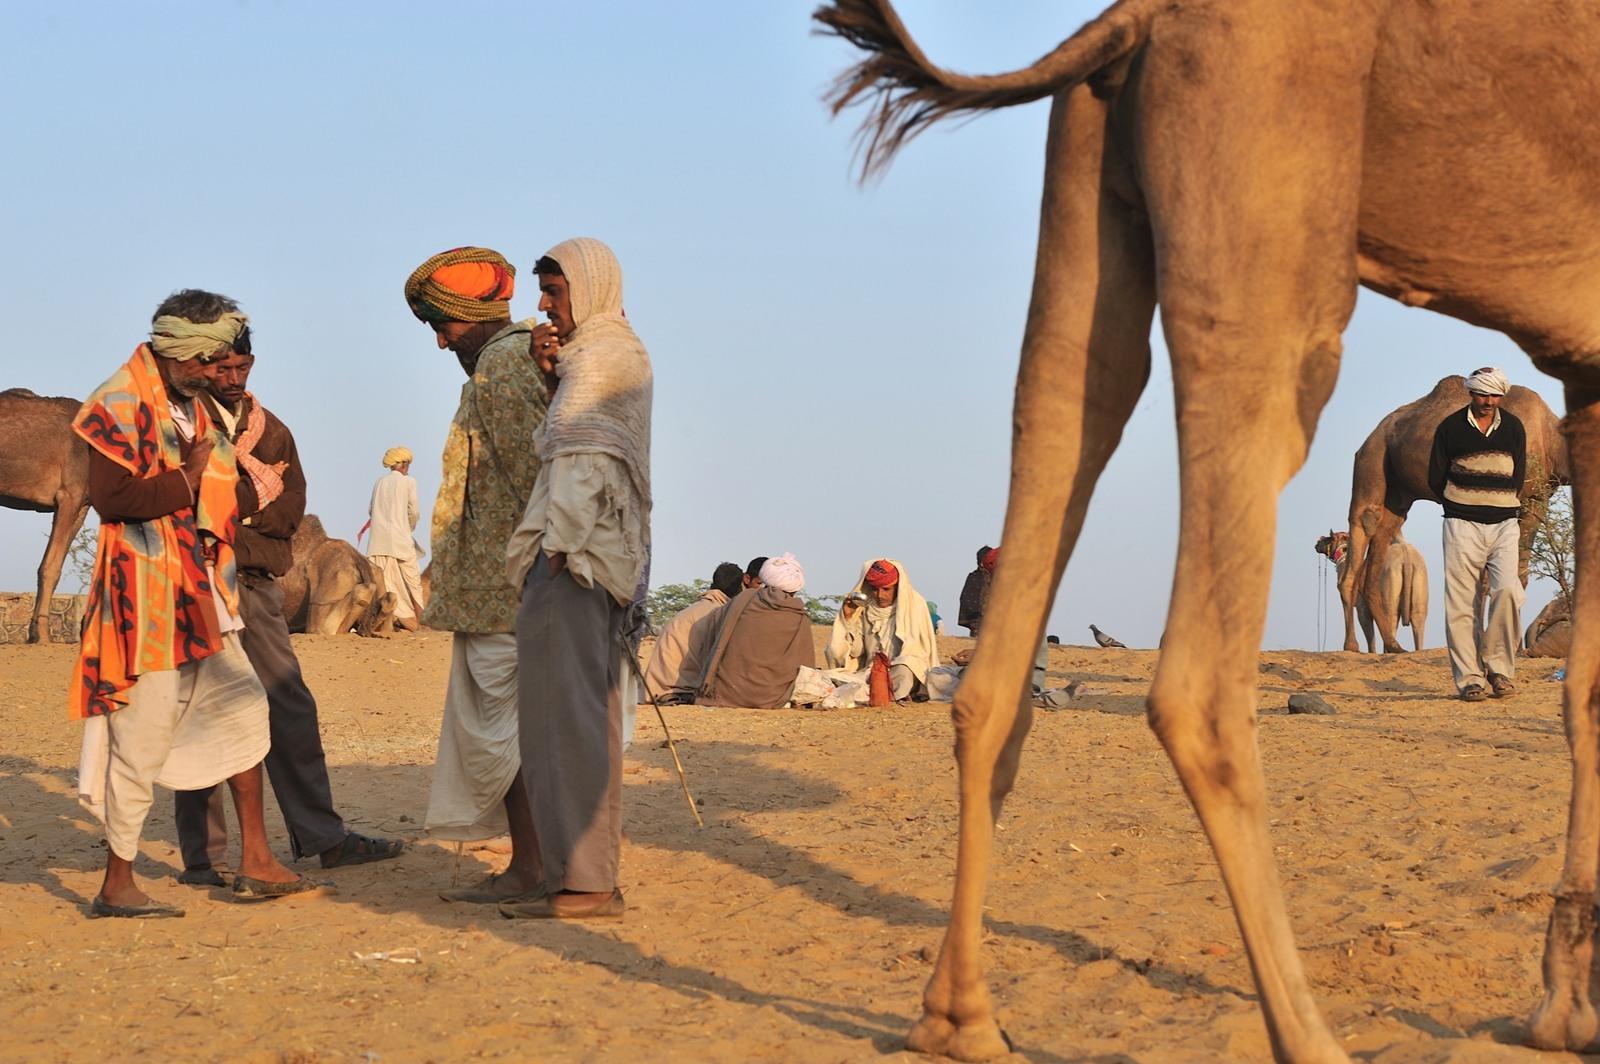 Pushkar Camel fair in Pushkar, Rajasthan, India. My attempt at a more complex combination of multiple scenes.